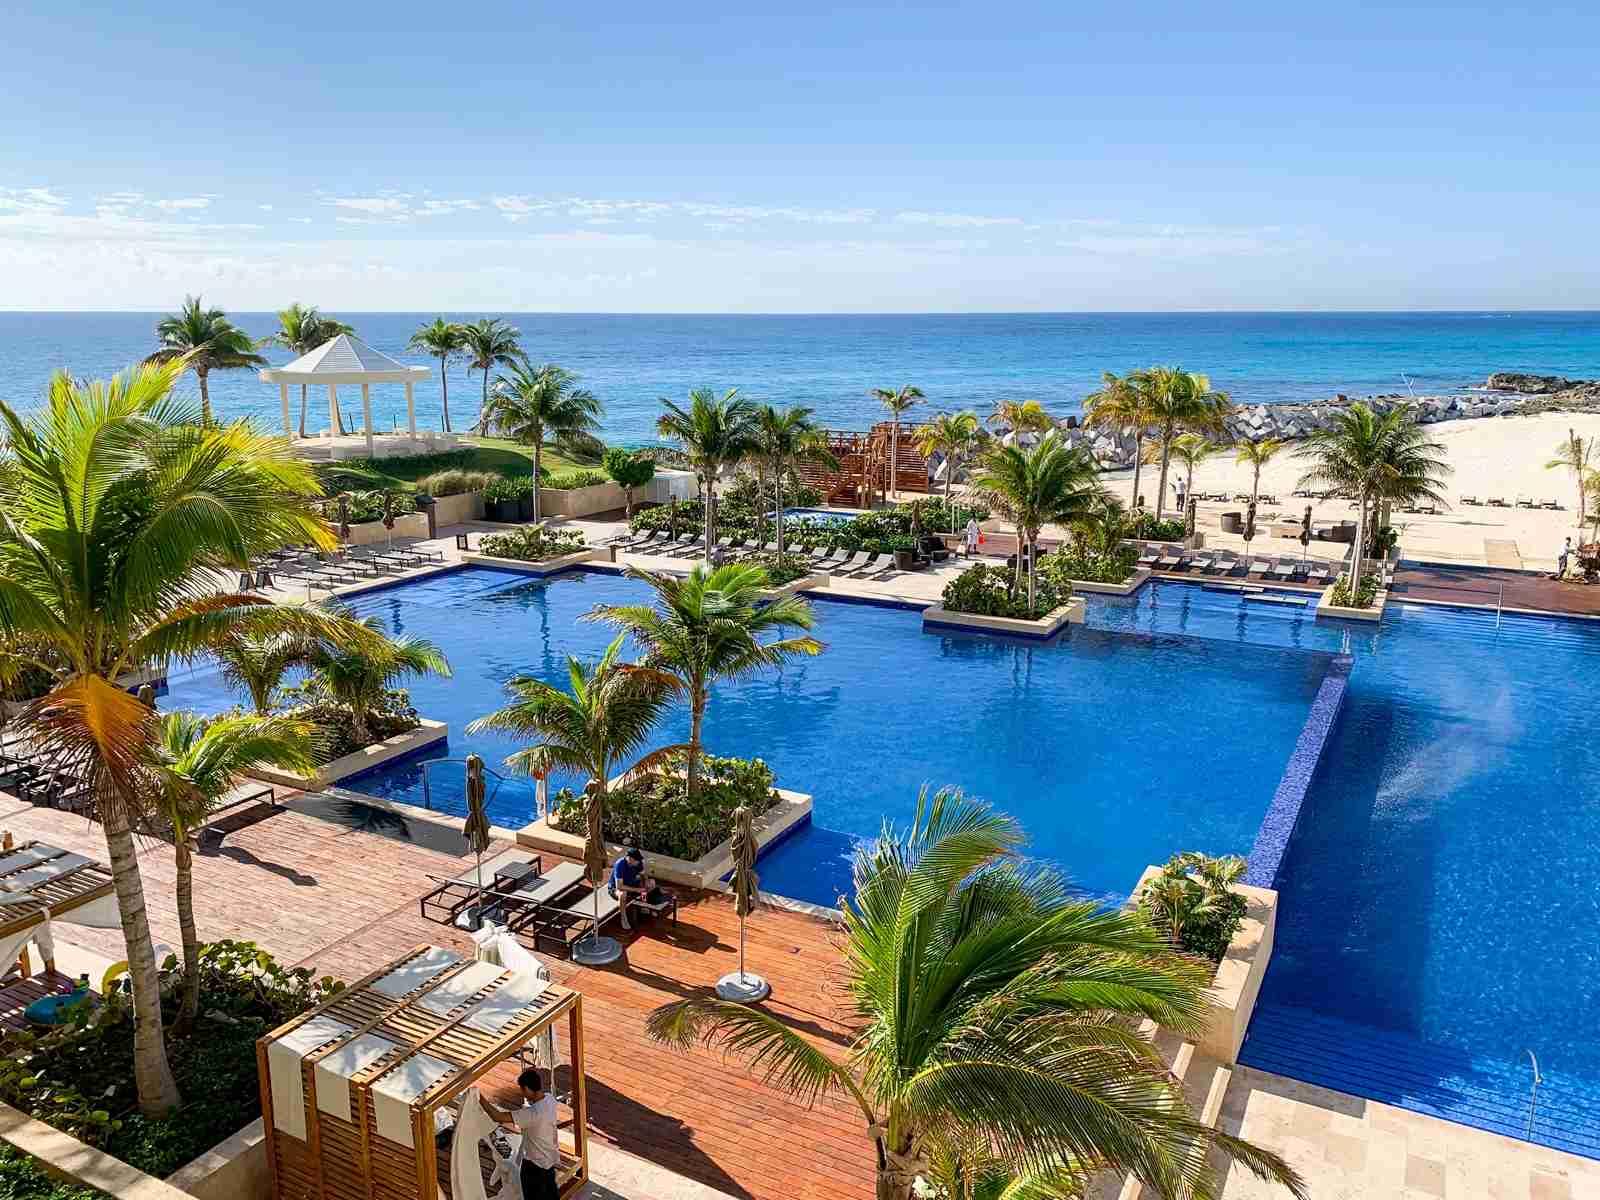 Hyatt Ziva all-inclusive in Cancun (Photo by Zach Griff)